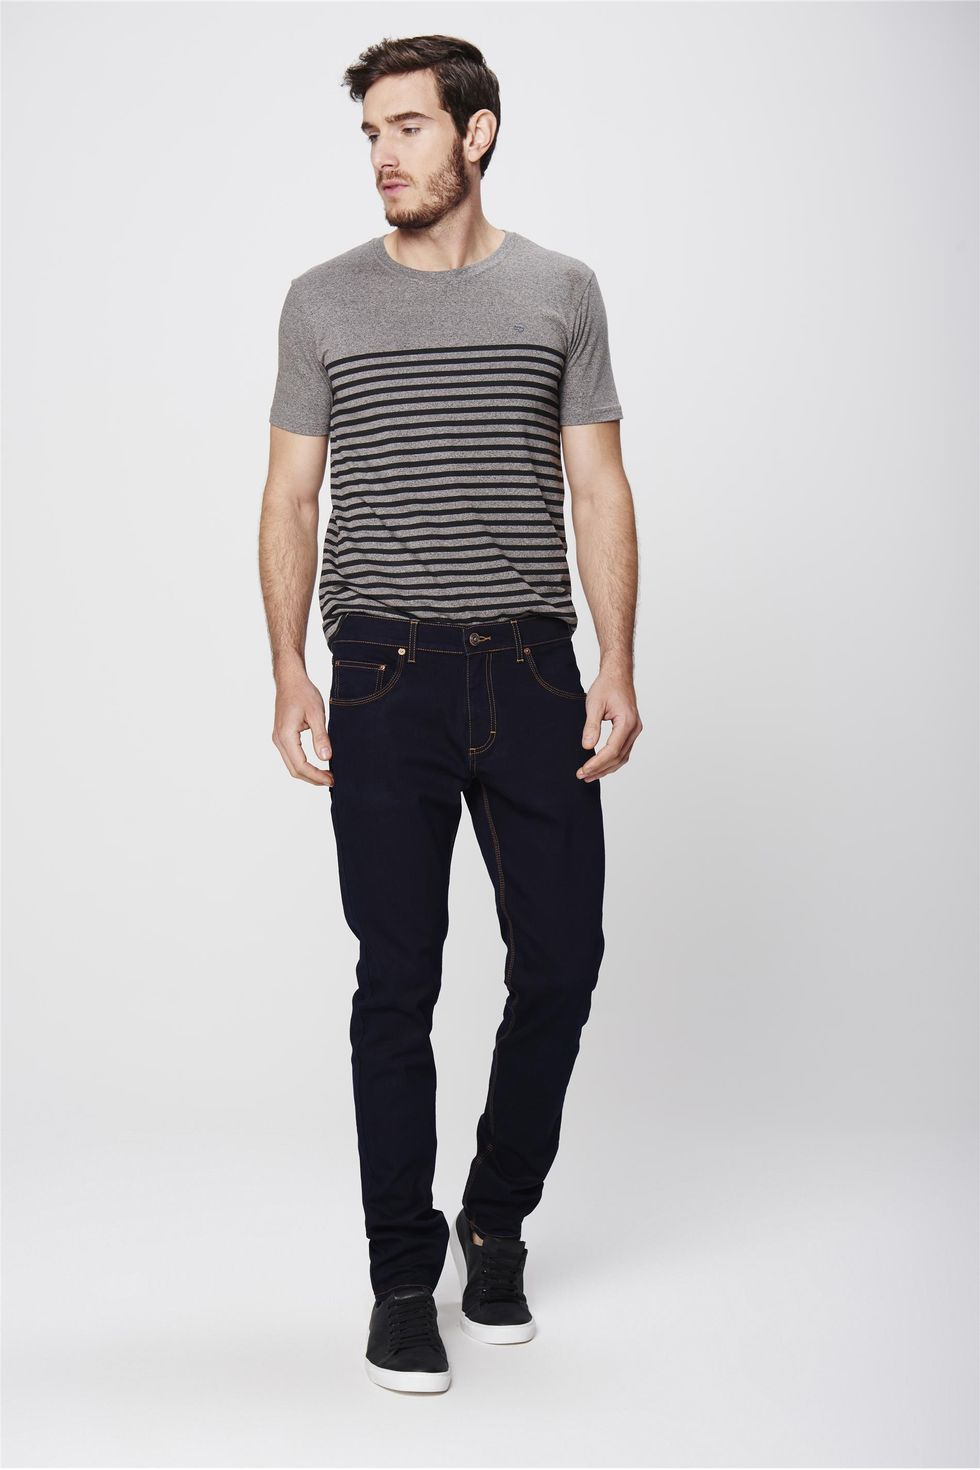 Calca-Skinny-Jeans-Masculina-Basica-Frente--